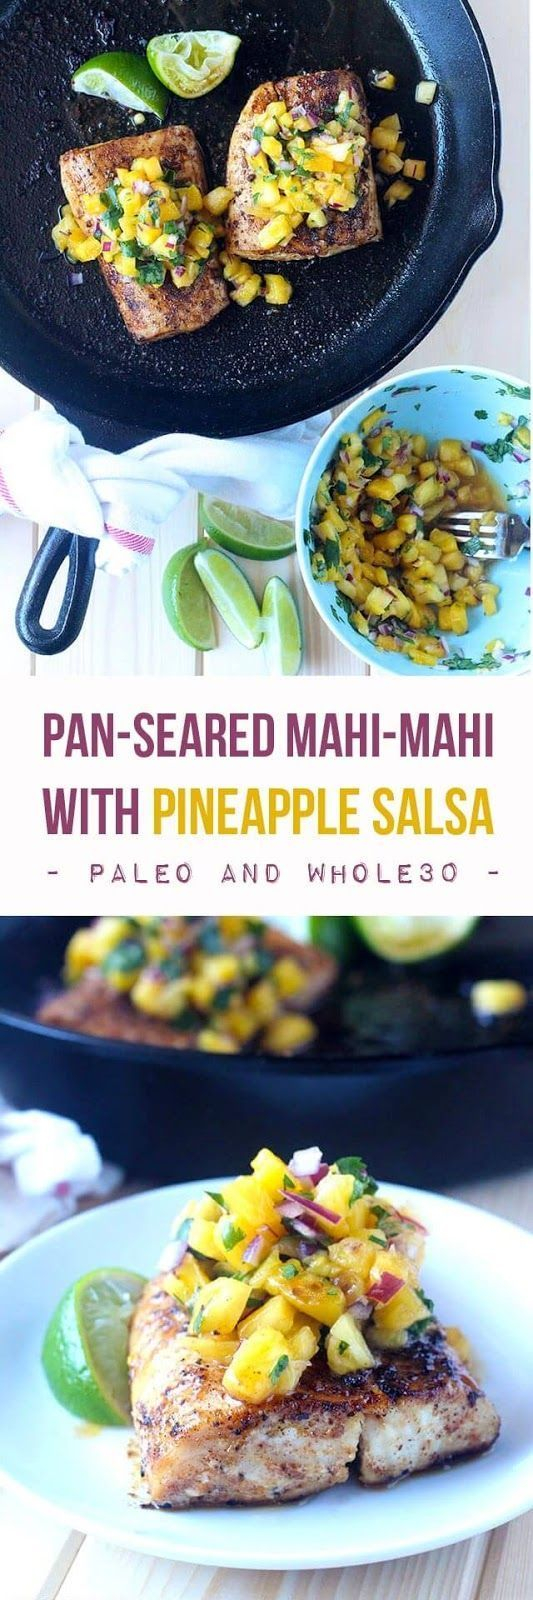 Healthy Fish Recipe: Pan-Seared Mahi-Mahi with Pineapple Salsa (Quick & Easy) | Real Food | Paleo | Whole30 |